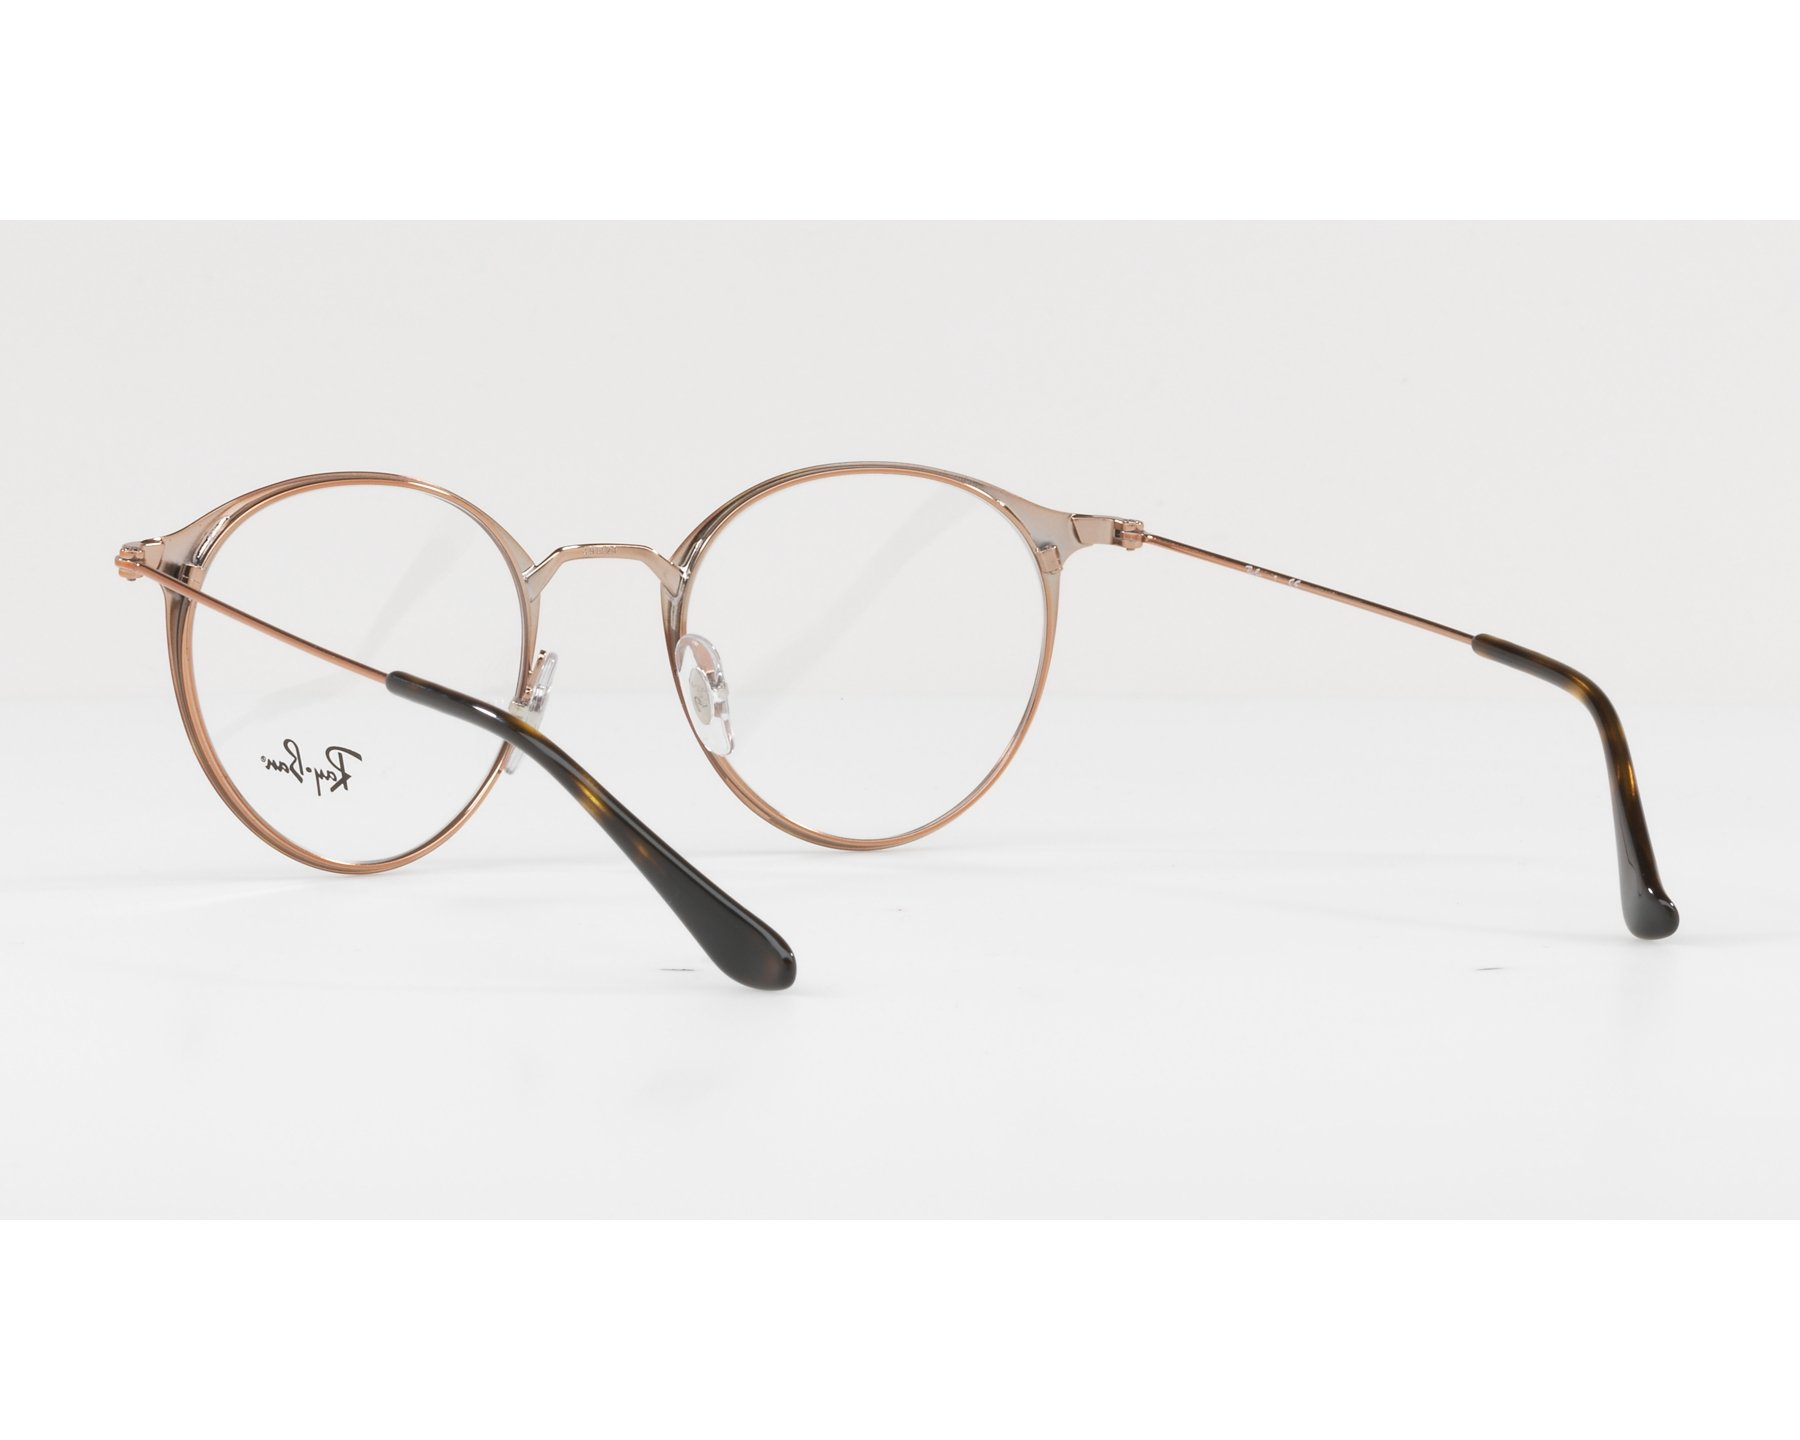 b69fd36bad Gafas Graduadas Ray-Ban RX-6378 2971 47-21 Havana Oro cobre Vista